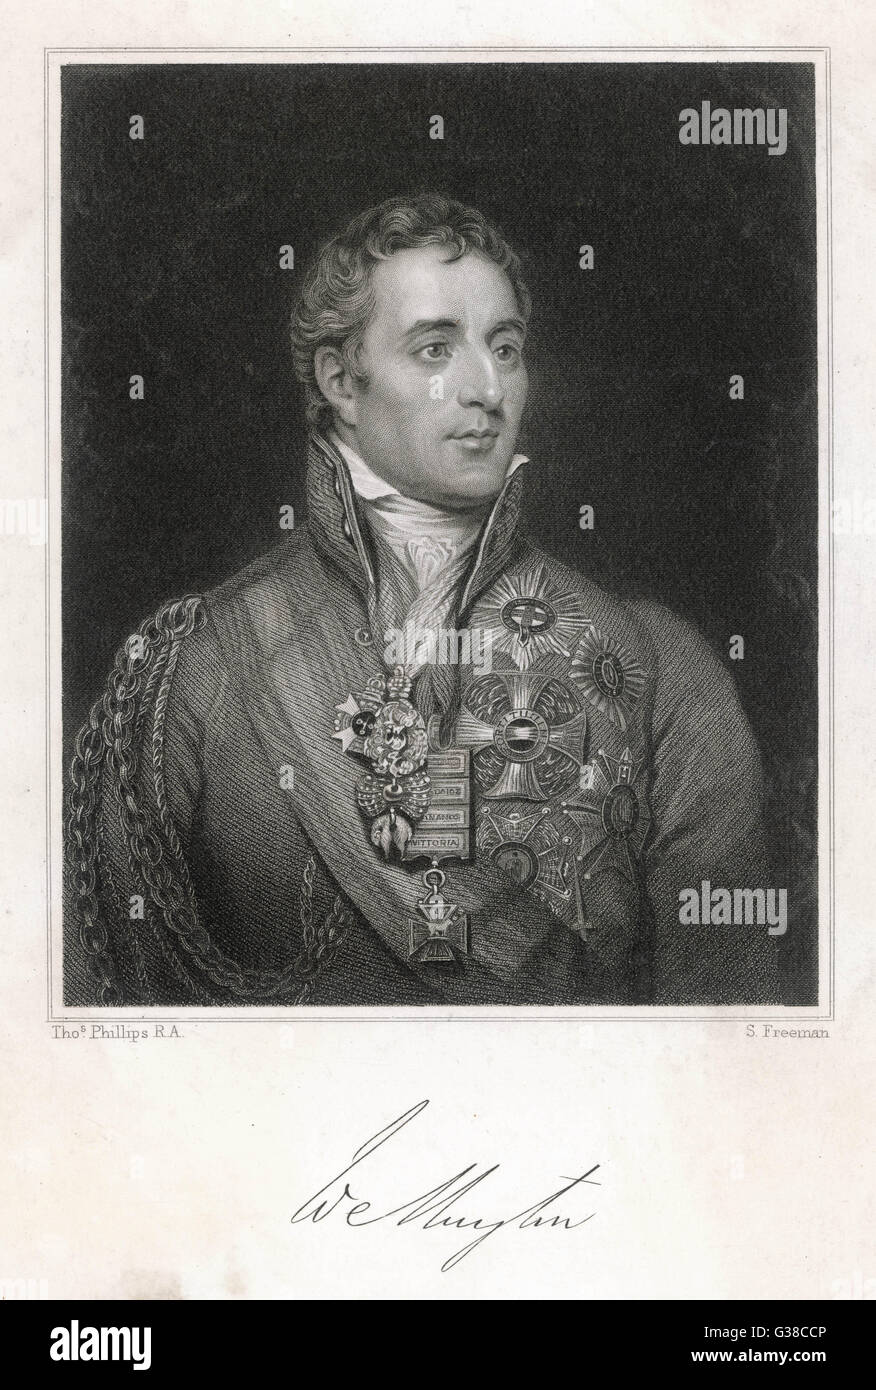 DUKE OF WELLINGTON -  formal portrait, aged circa 40        Date: 1769 - 1852 - Stock Image